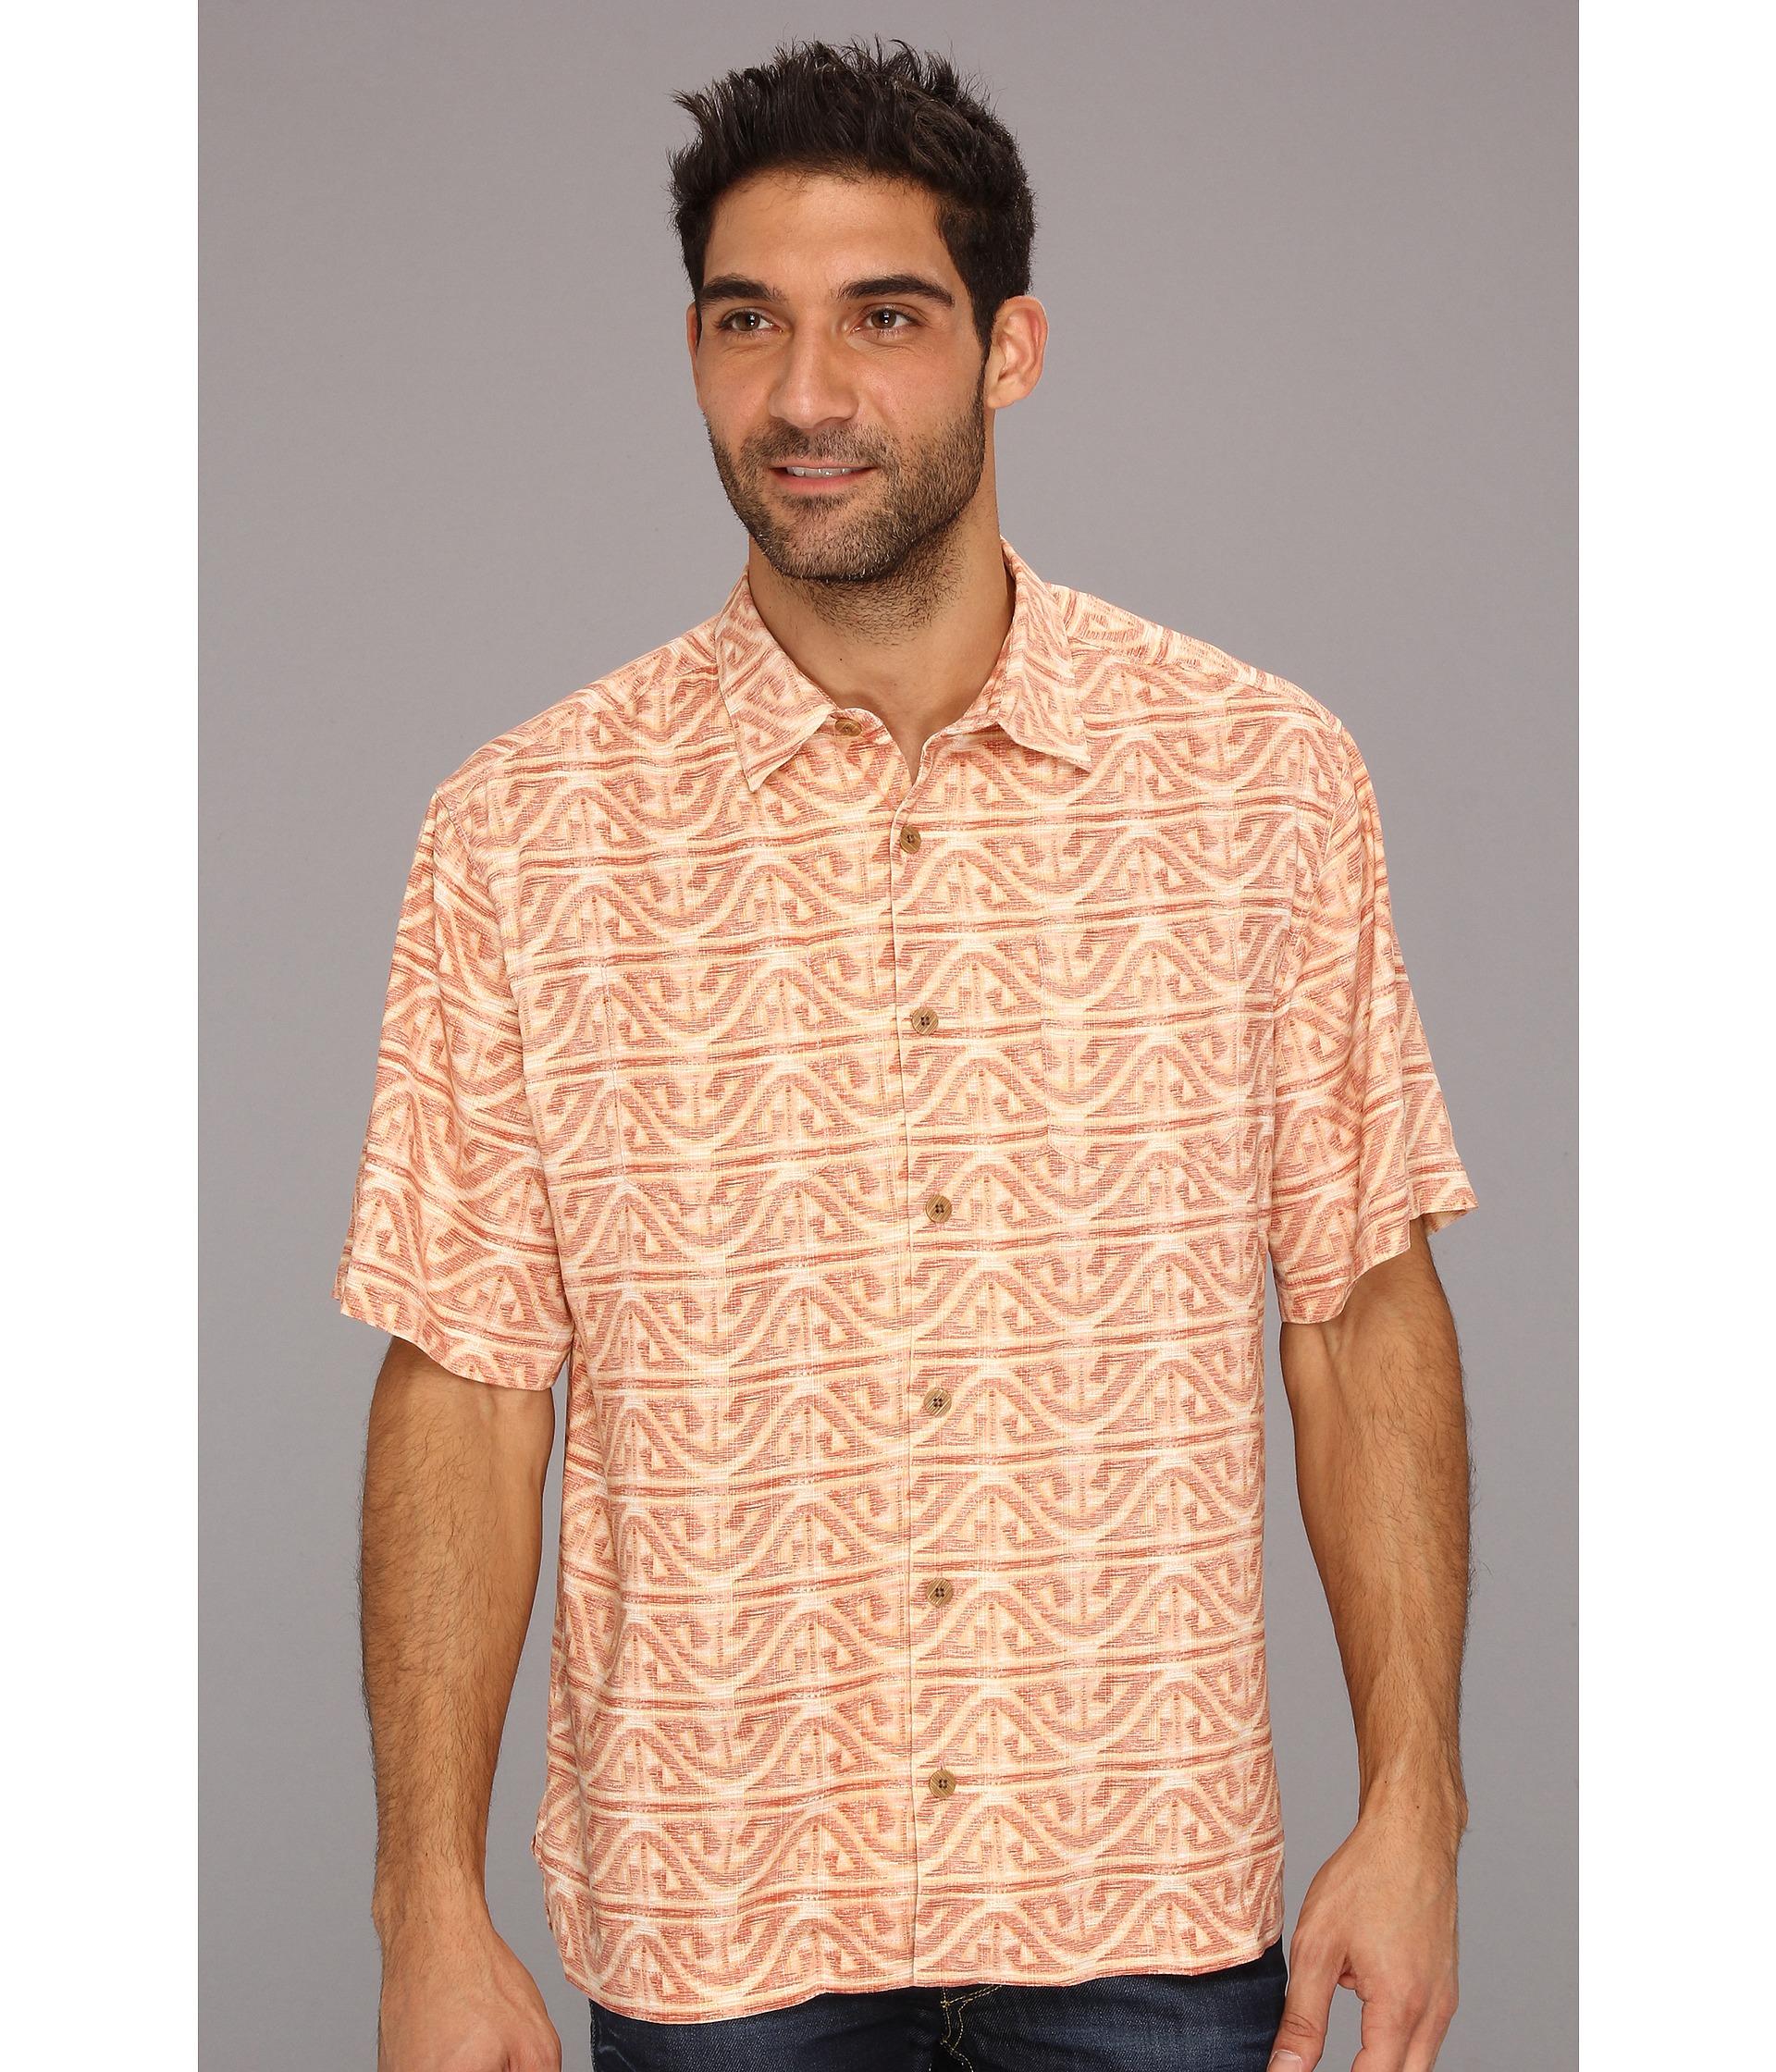 Tommy bahama gibraltar tile camp shirt in orange for men for Tommy bahama christmas shirt 2014